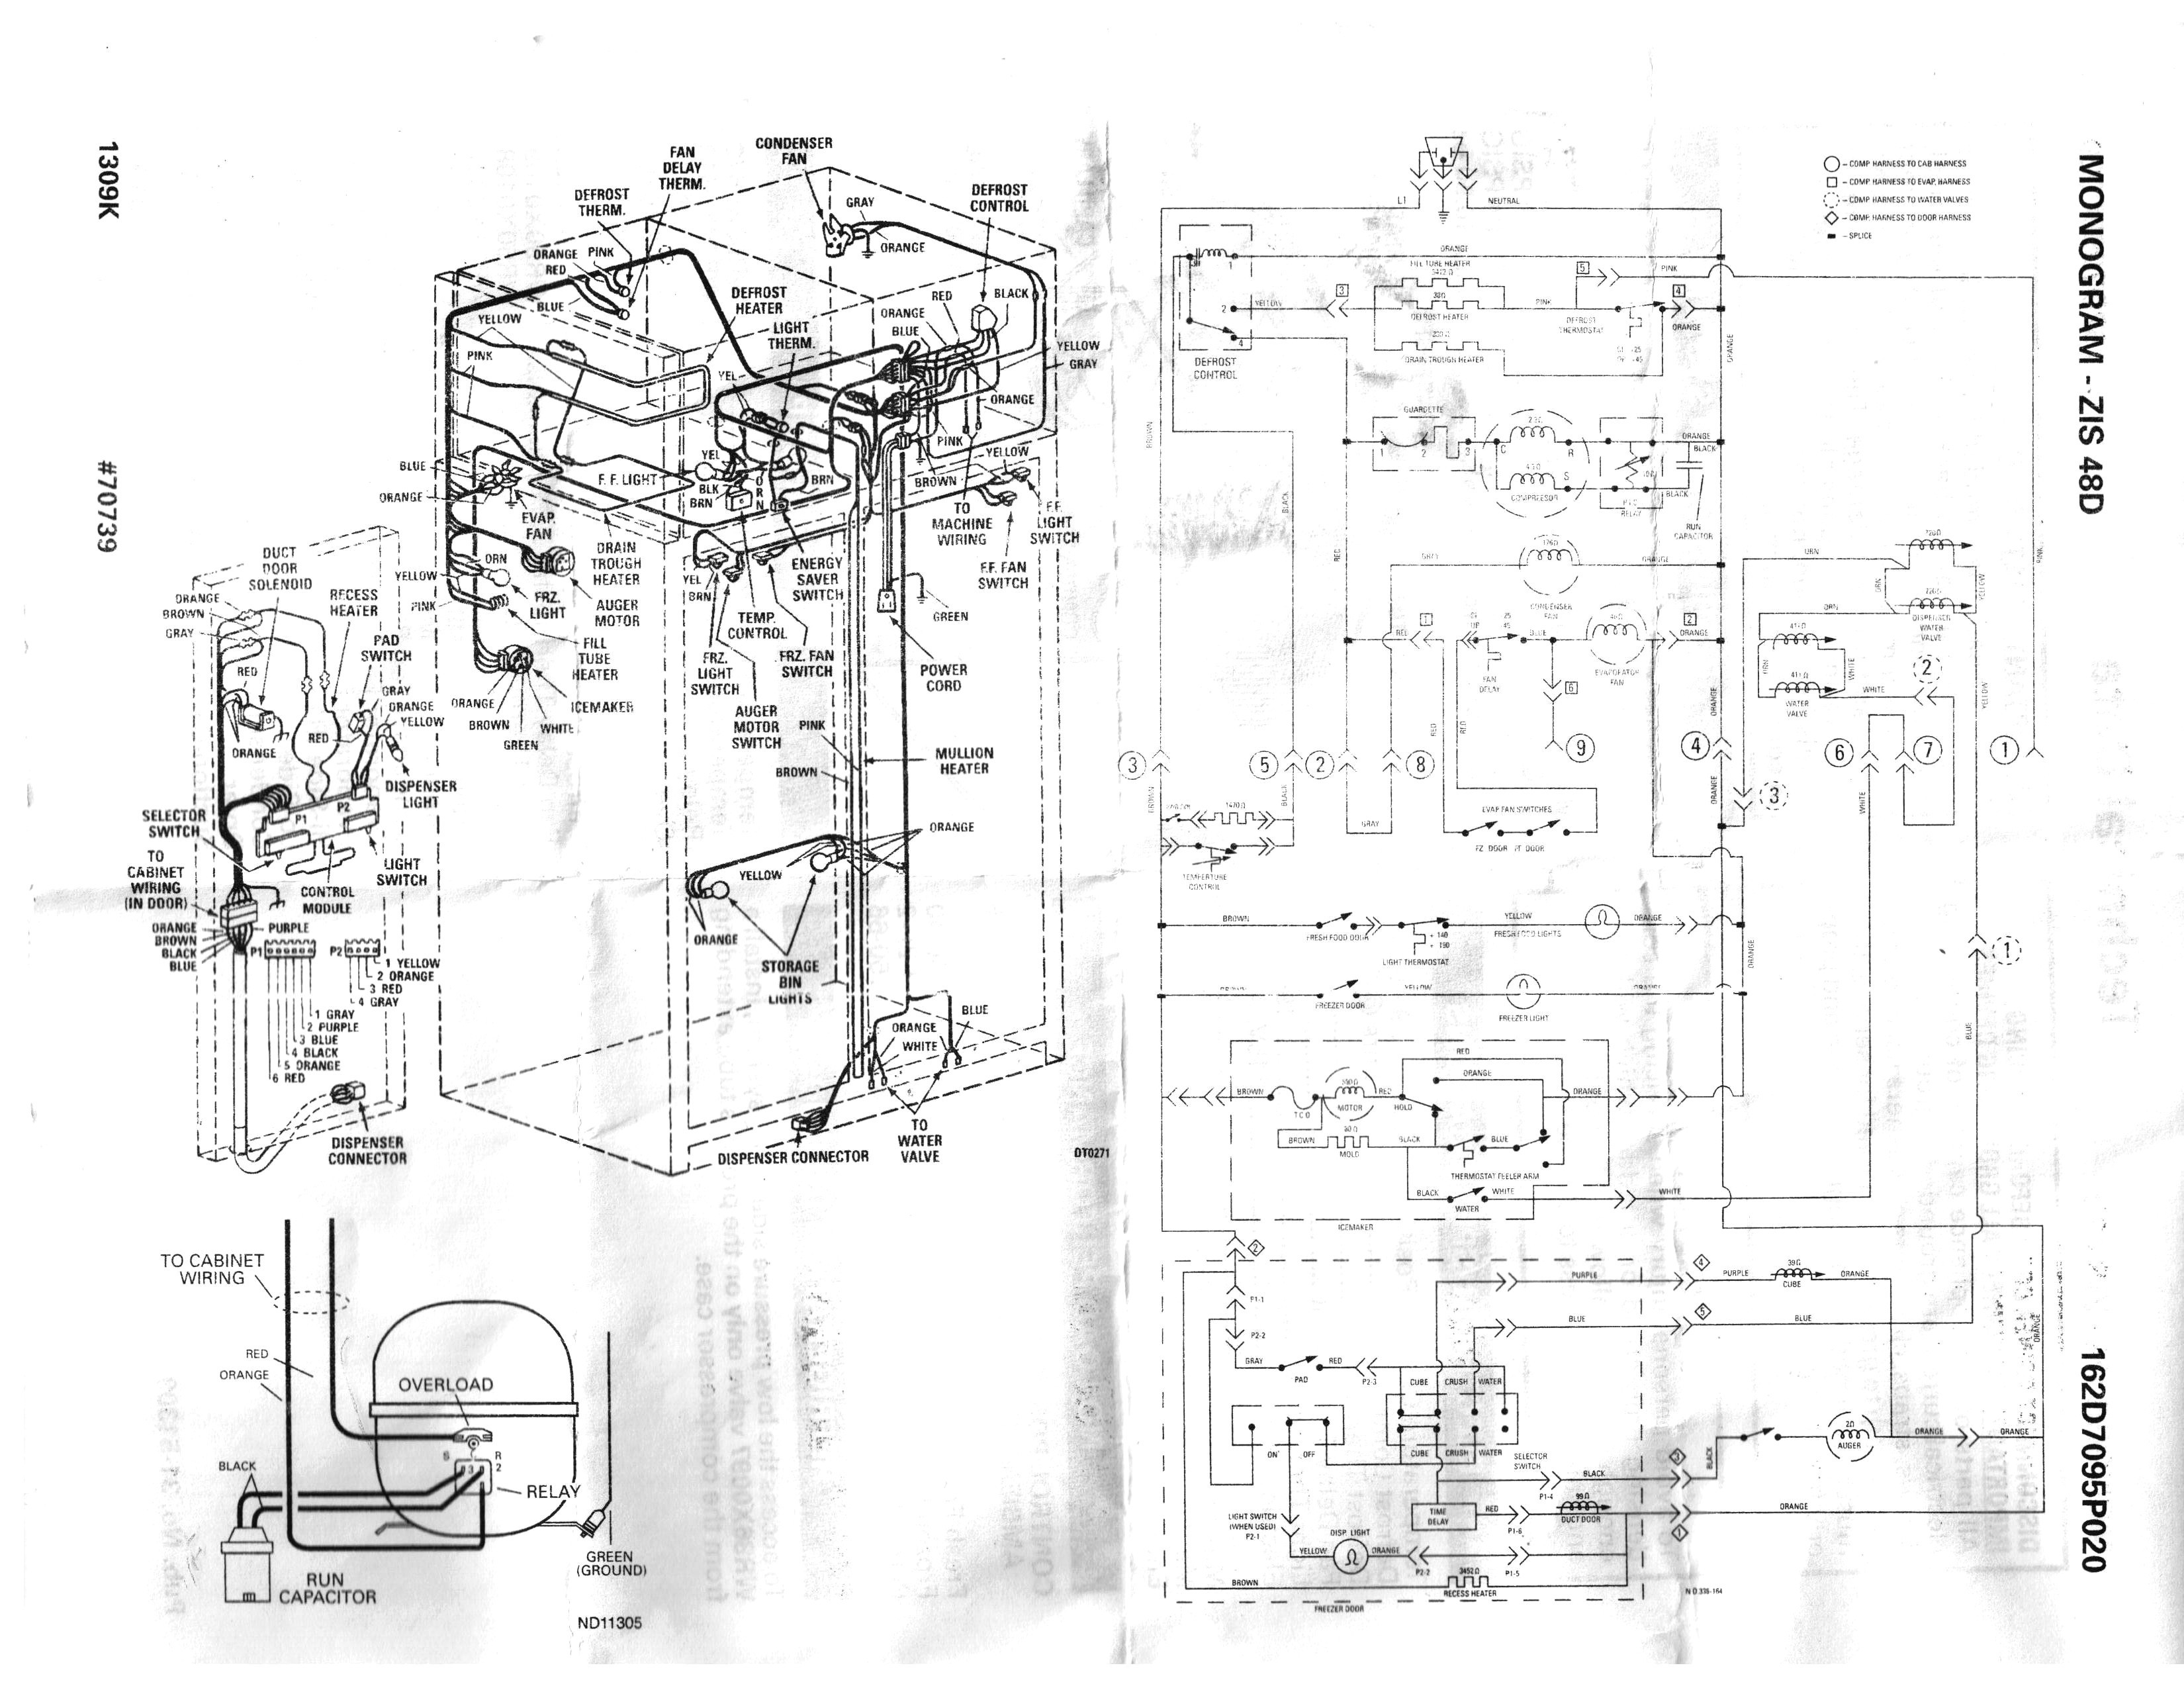 Ge Freezer Schematic Wiring Diagram Within Refrigerator chunyan